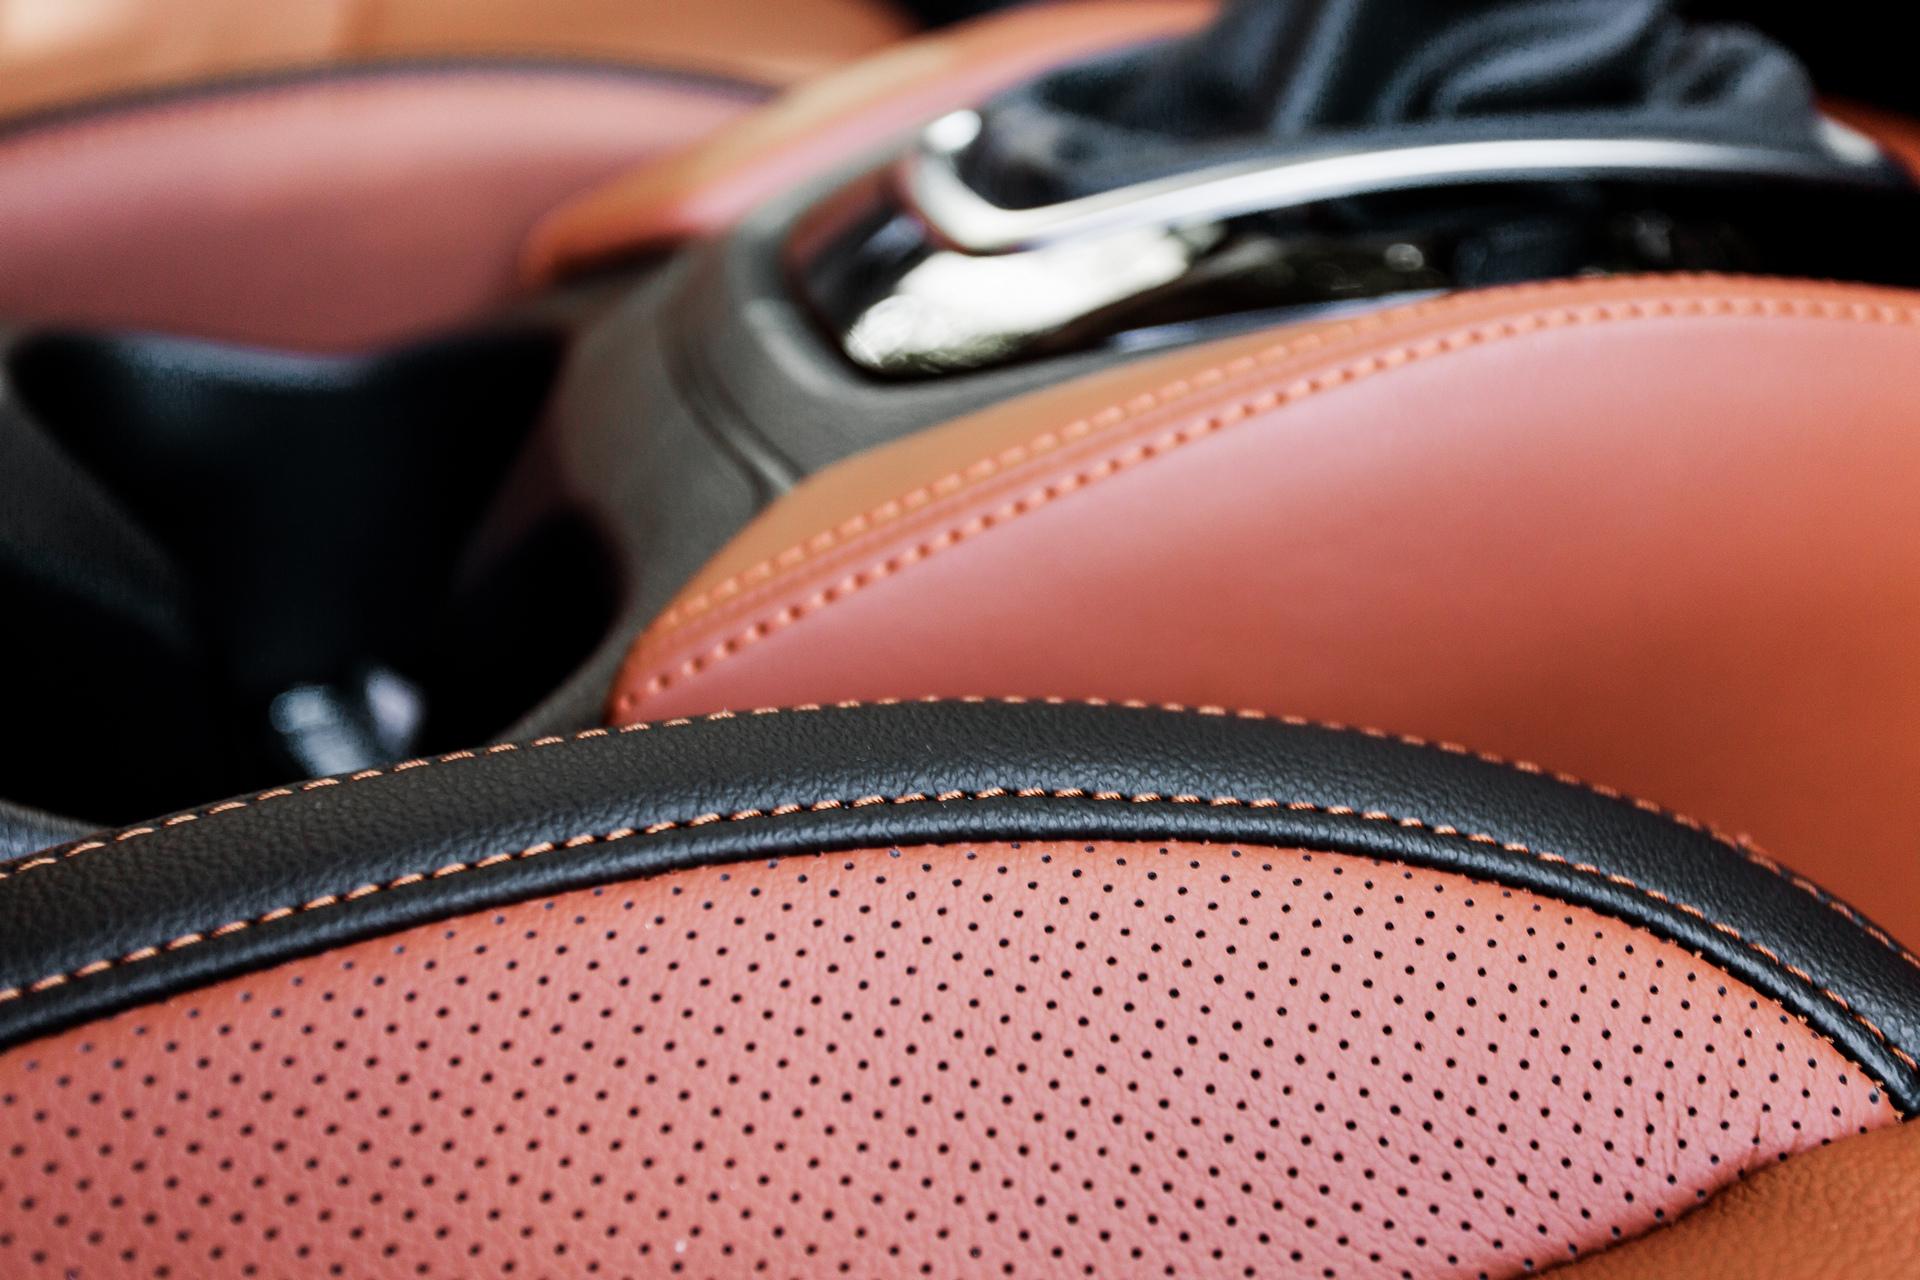 2017 Nissan Rogue © Nissan Motor Co., Ltd.